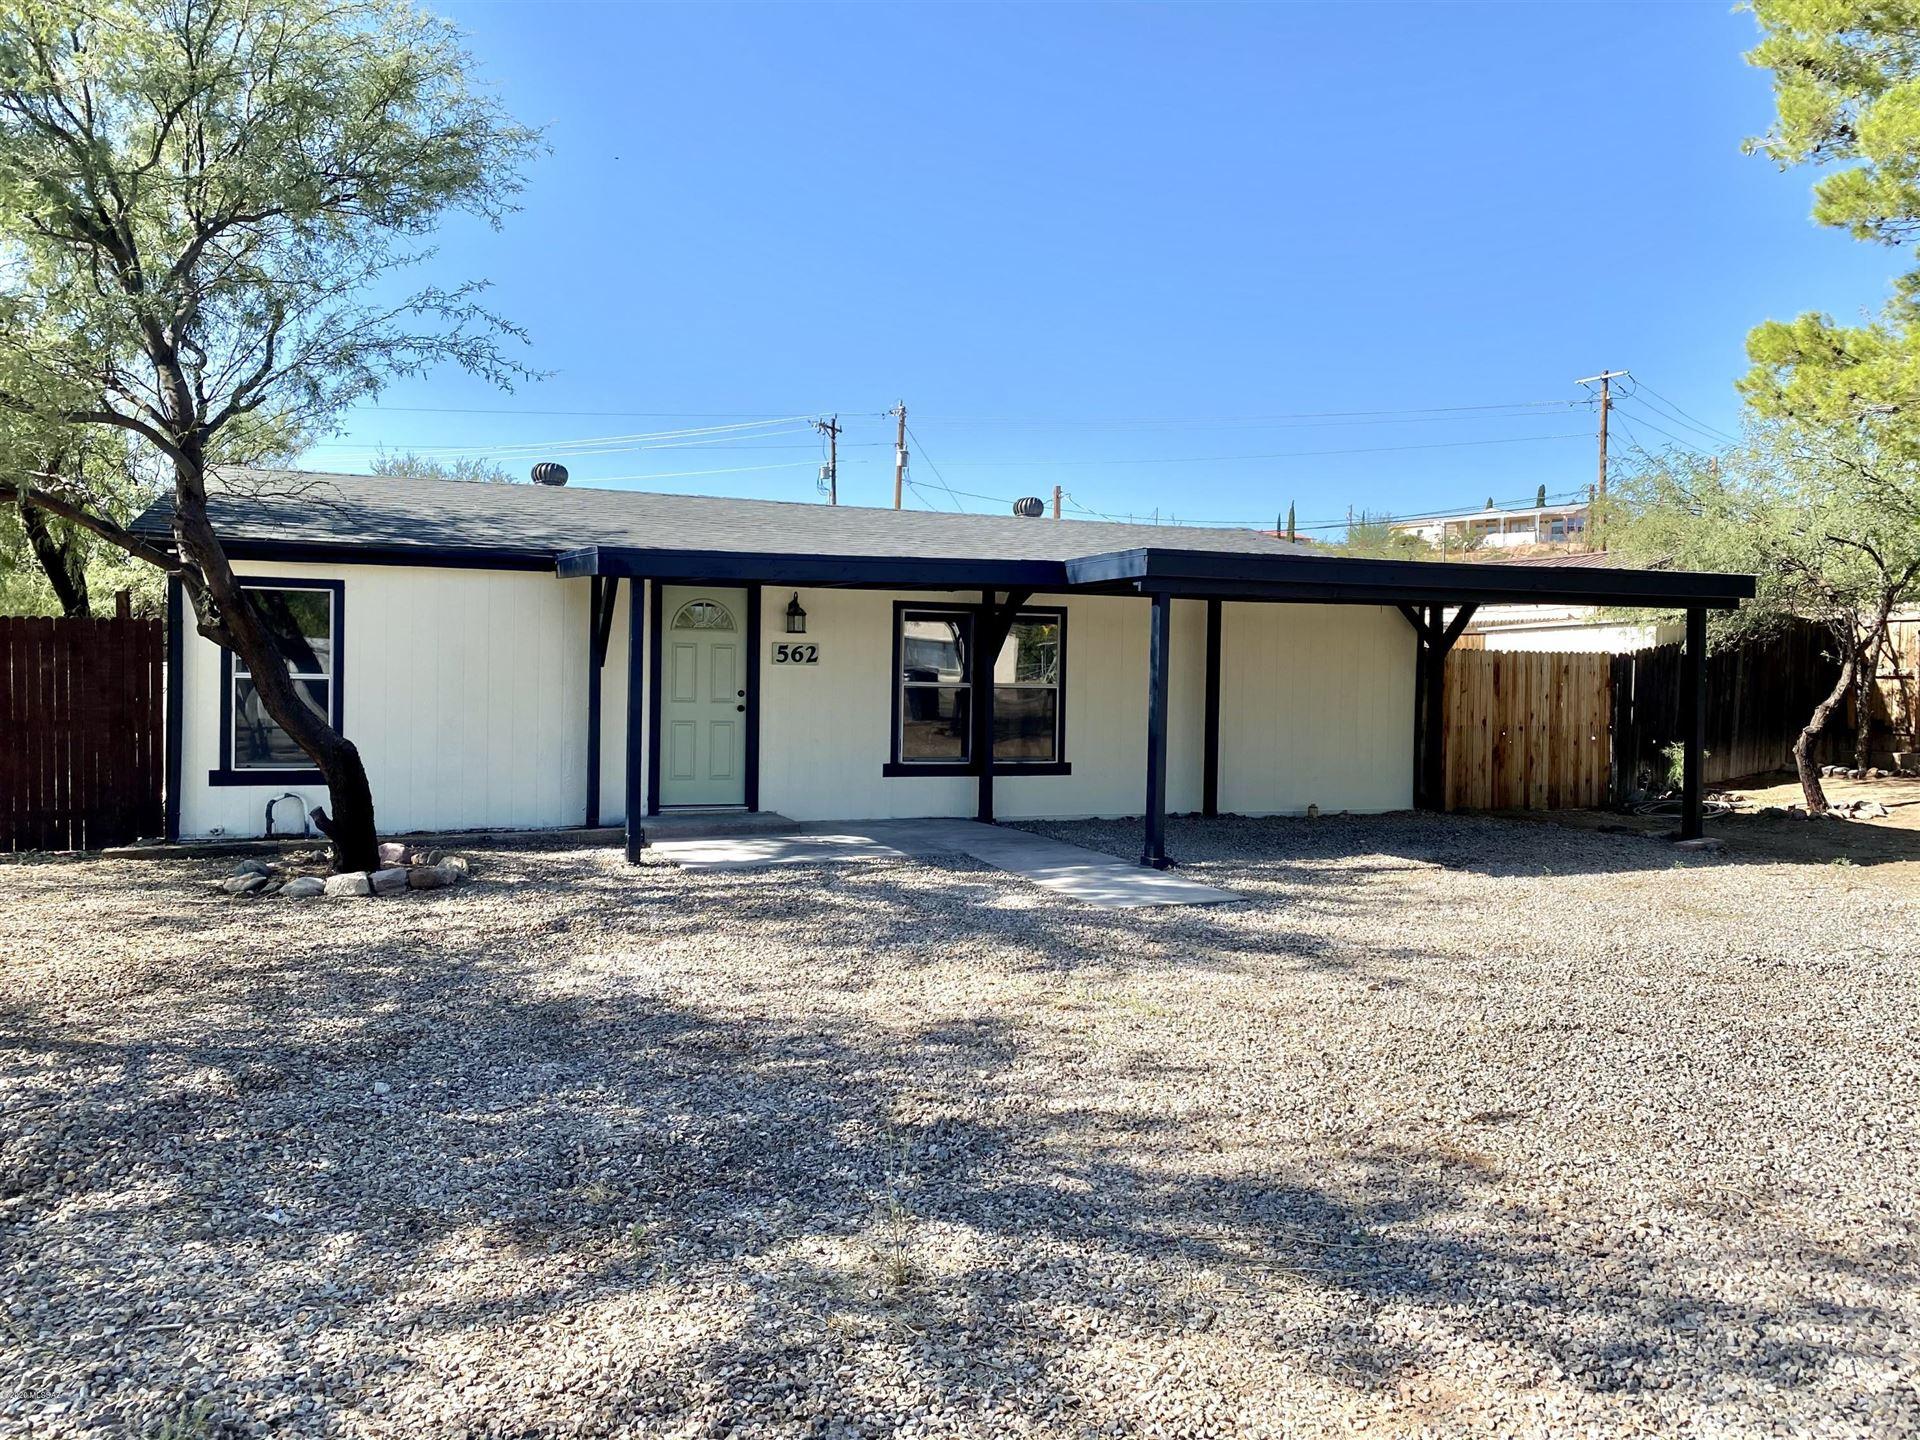 562 E 7th Street, Benson, AZ 85602 - MLS#: 22024277